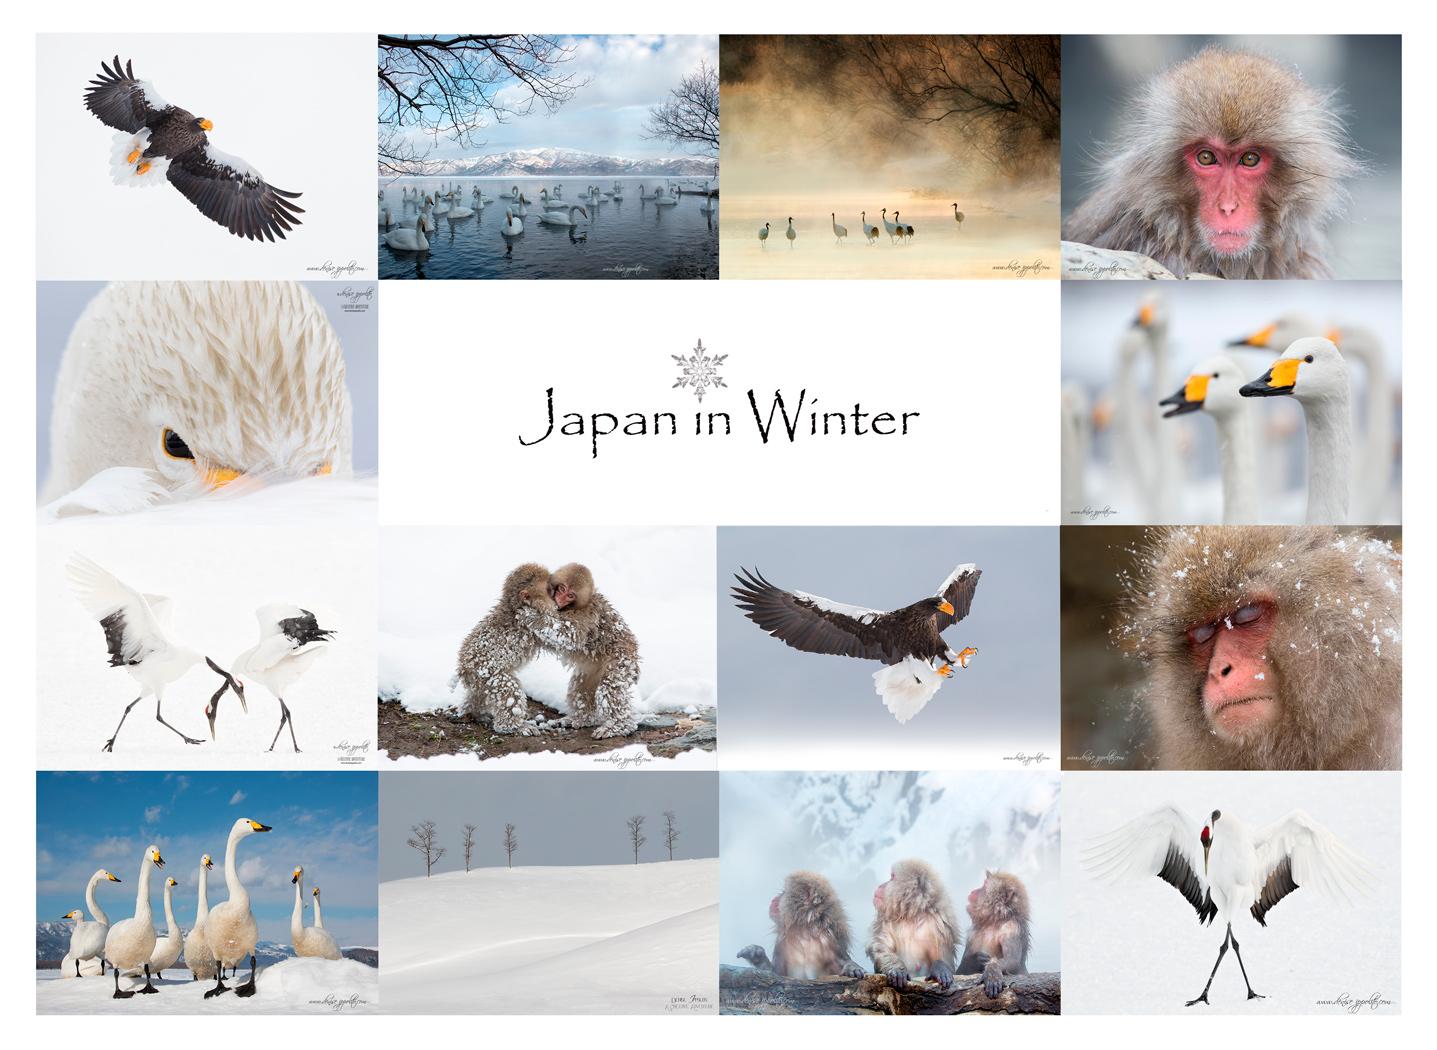 Japan-in-Winter.jpg